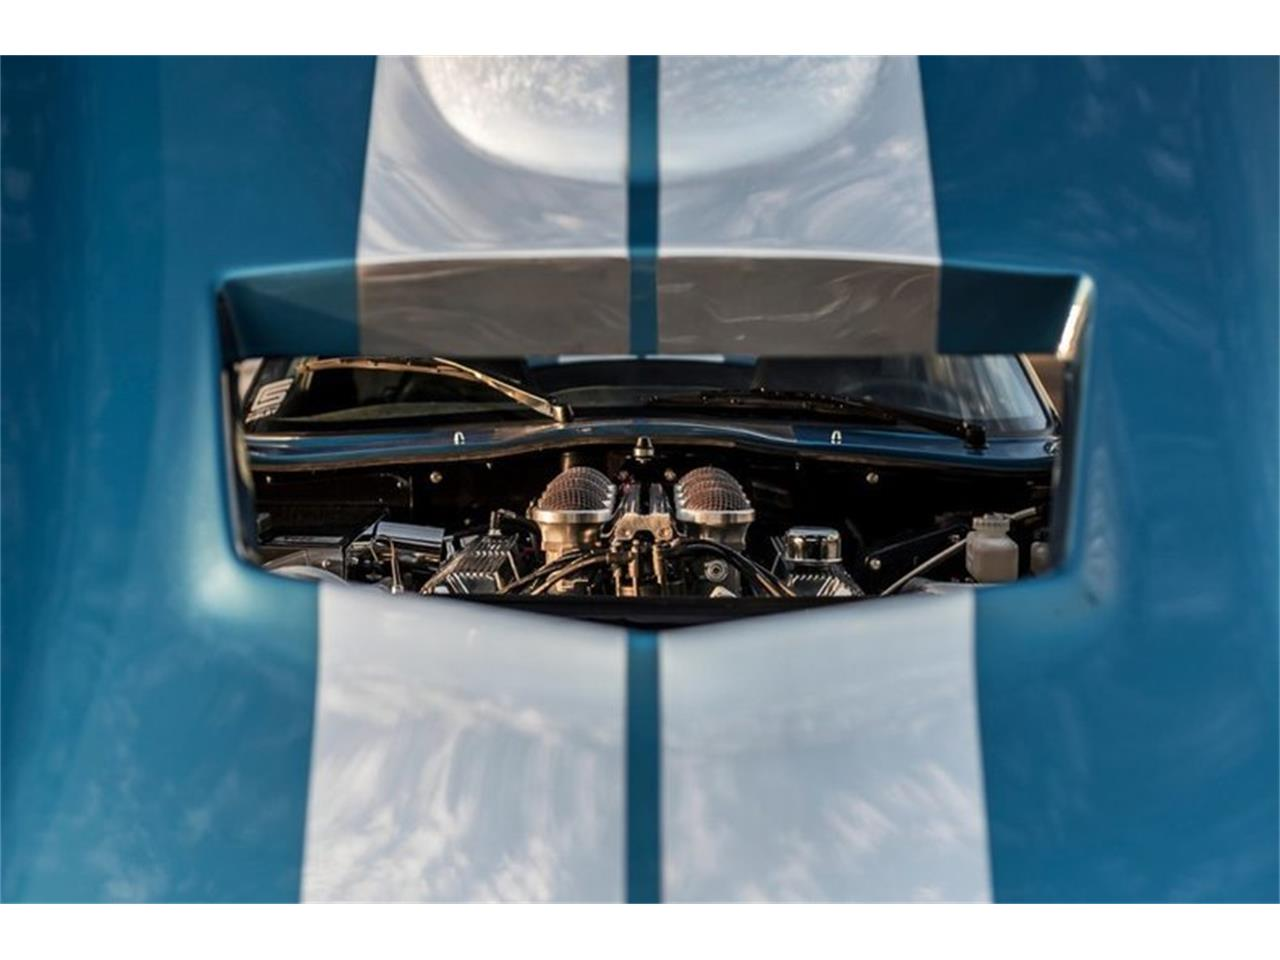 Large Picture of Classic '64 Cobra located in California - $395,000.00 - PNWD